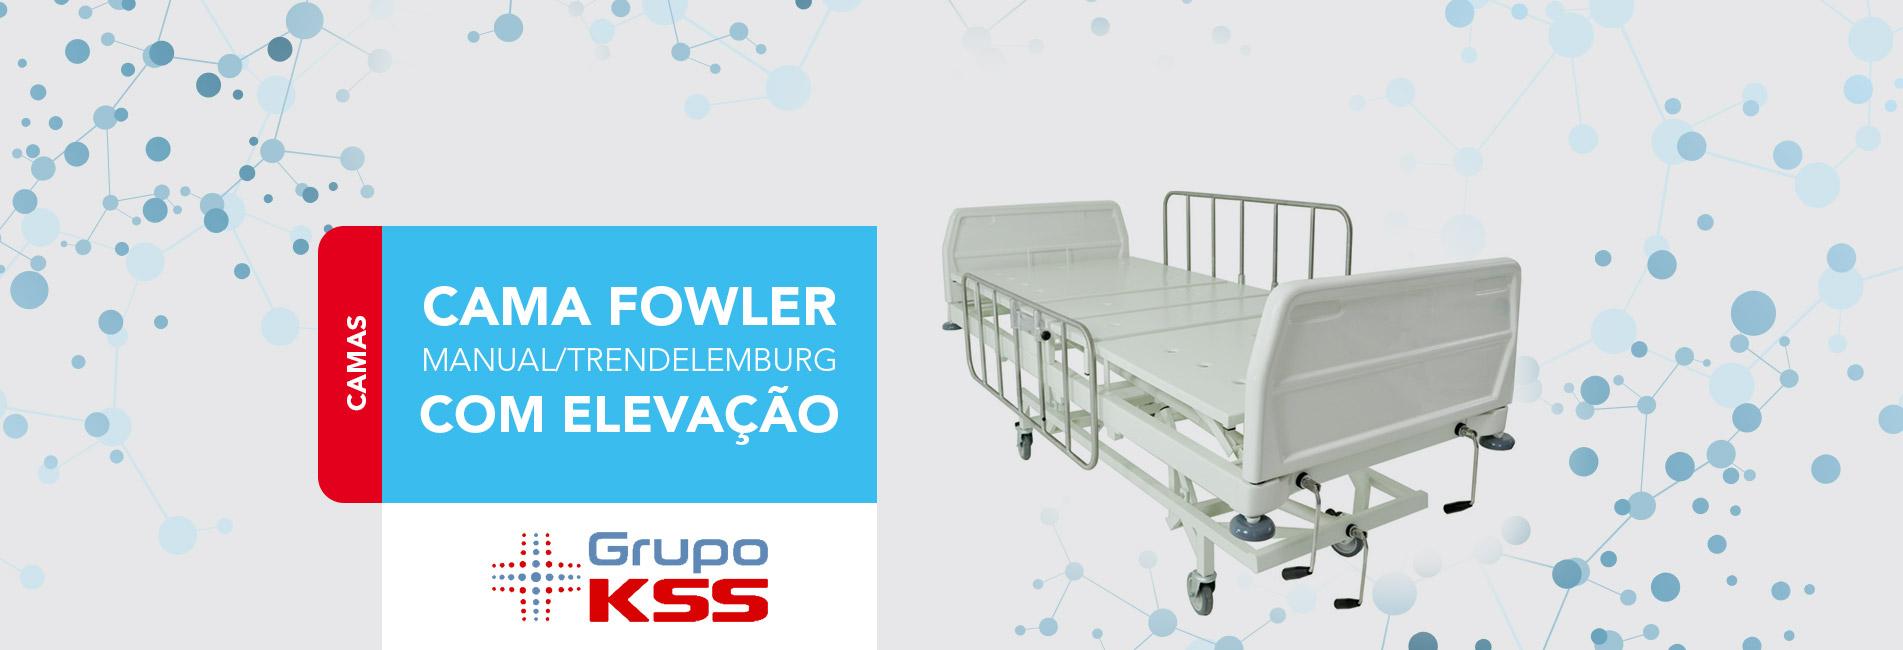 slider_cama-fowler